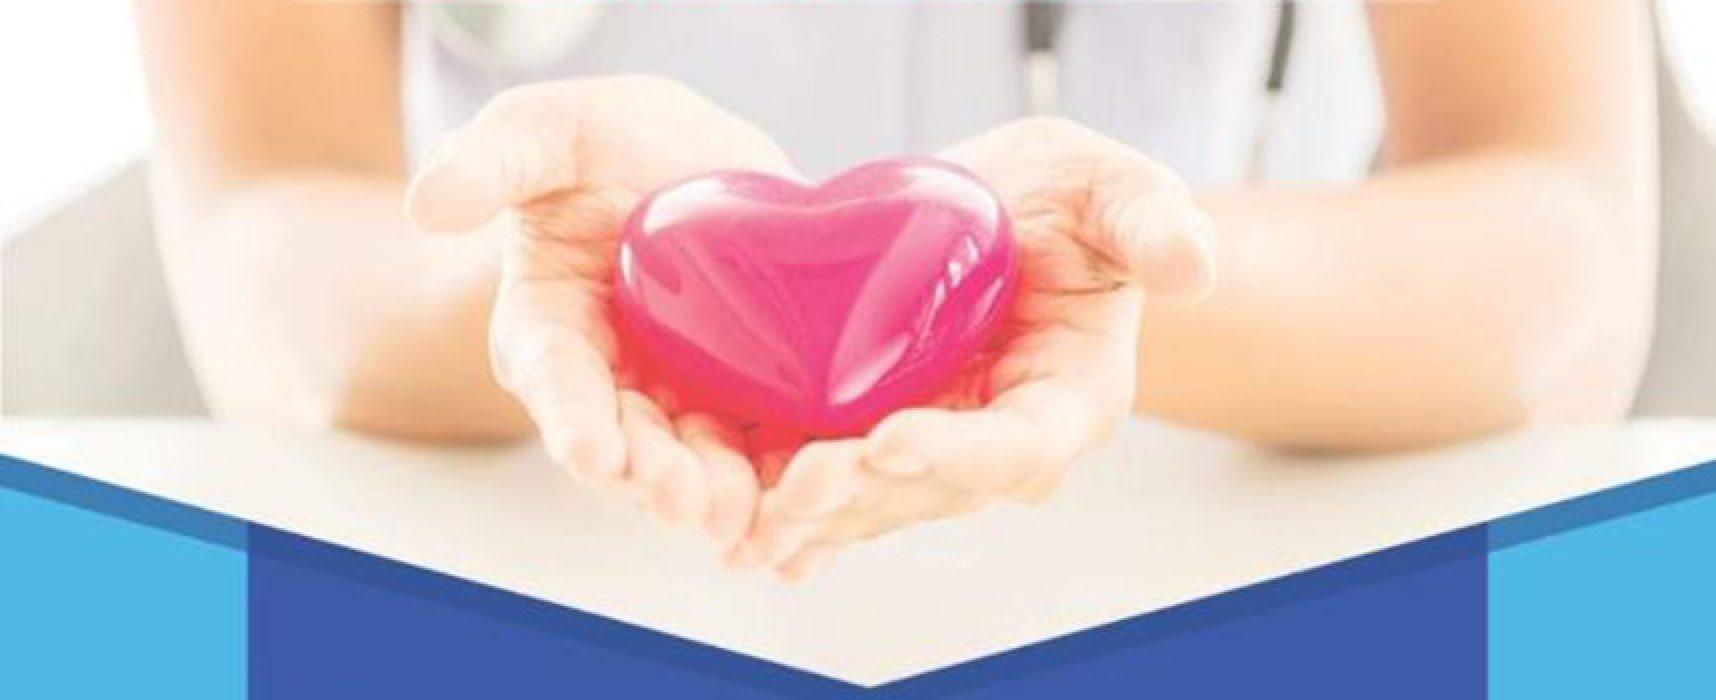 Giornata Salute: oggi screening gratuiti di prevenzione a Bisceglie